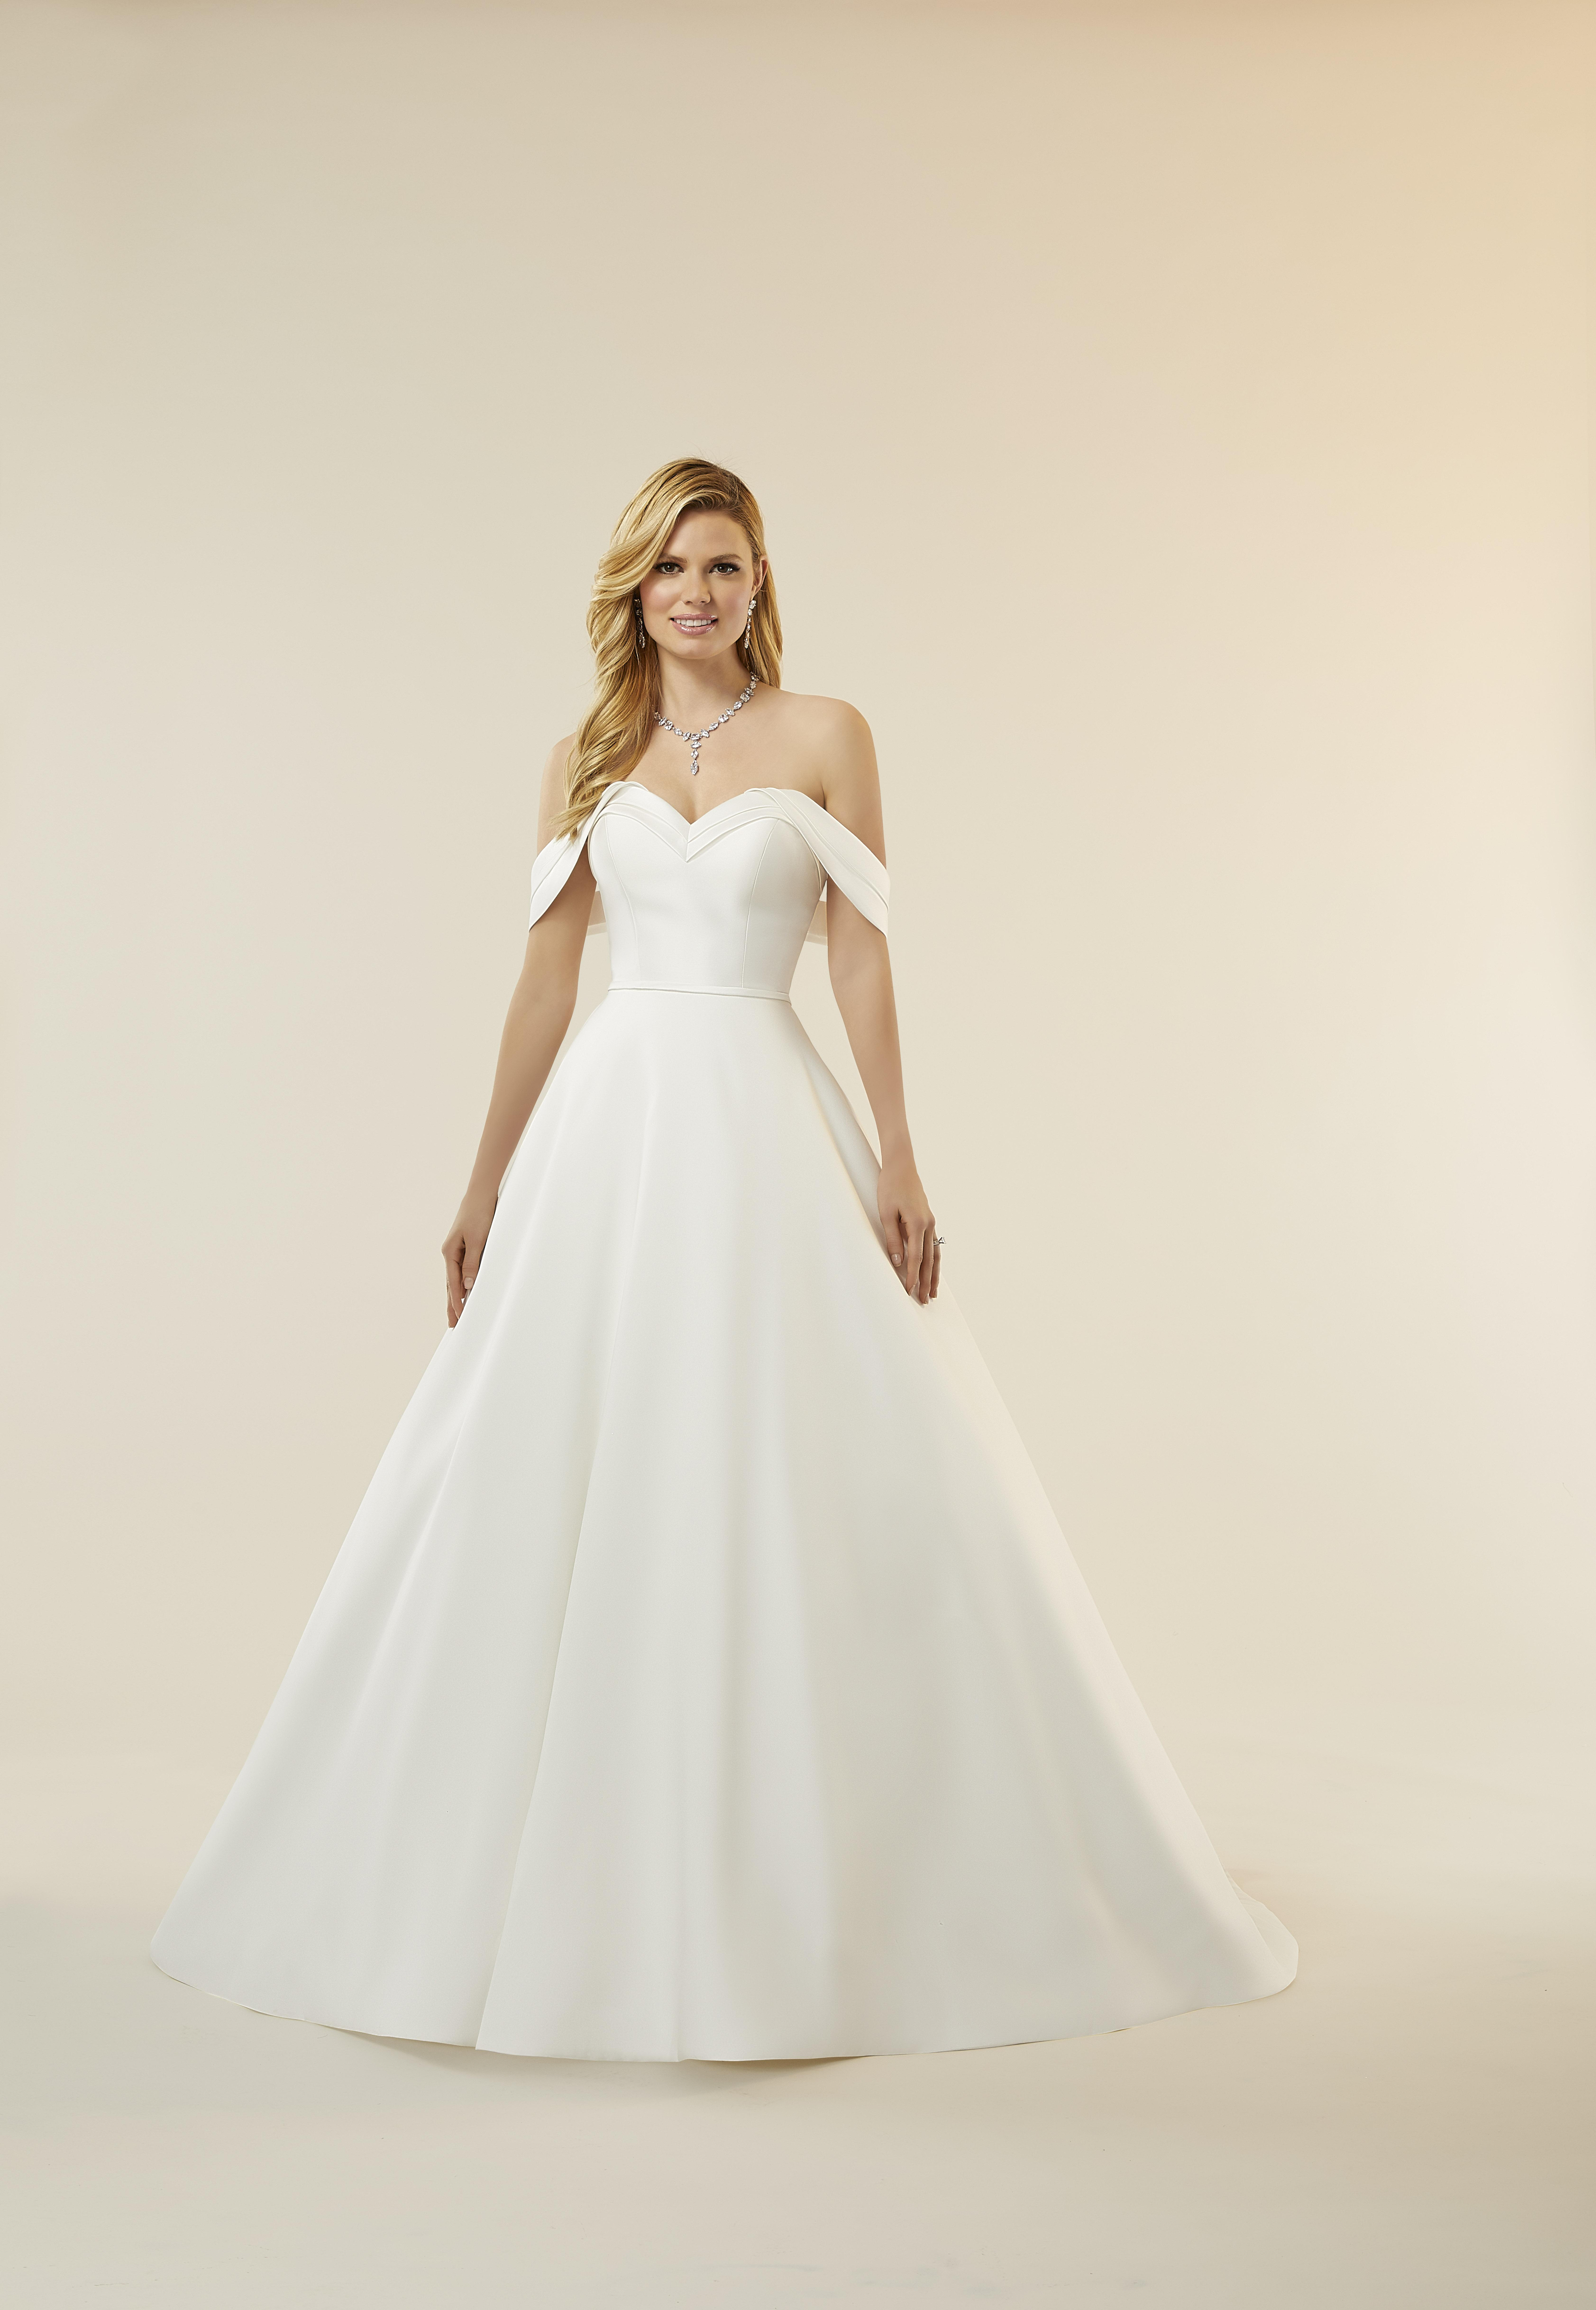 Madeline-Gardner-New-York-51704-wedding-dress-marianne